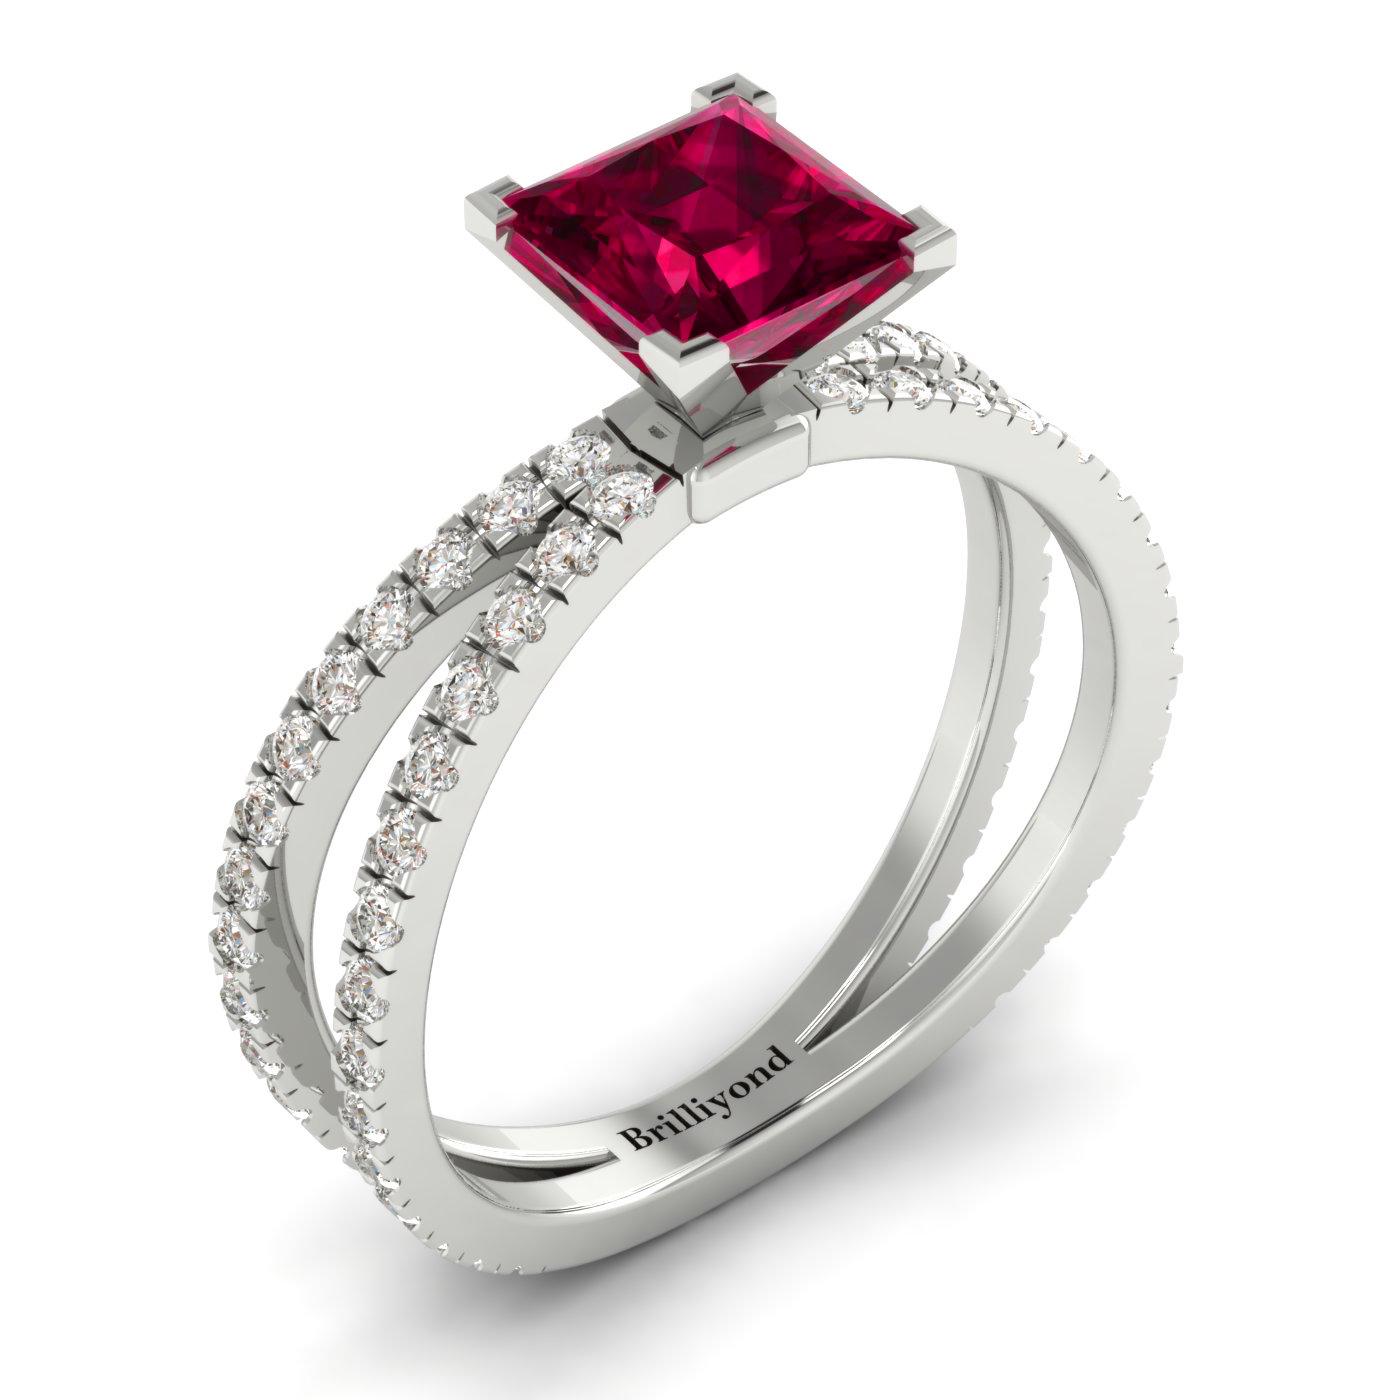 Ruby White Gold Princess Cut Engagement Ring Florentine_image2